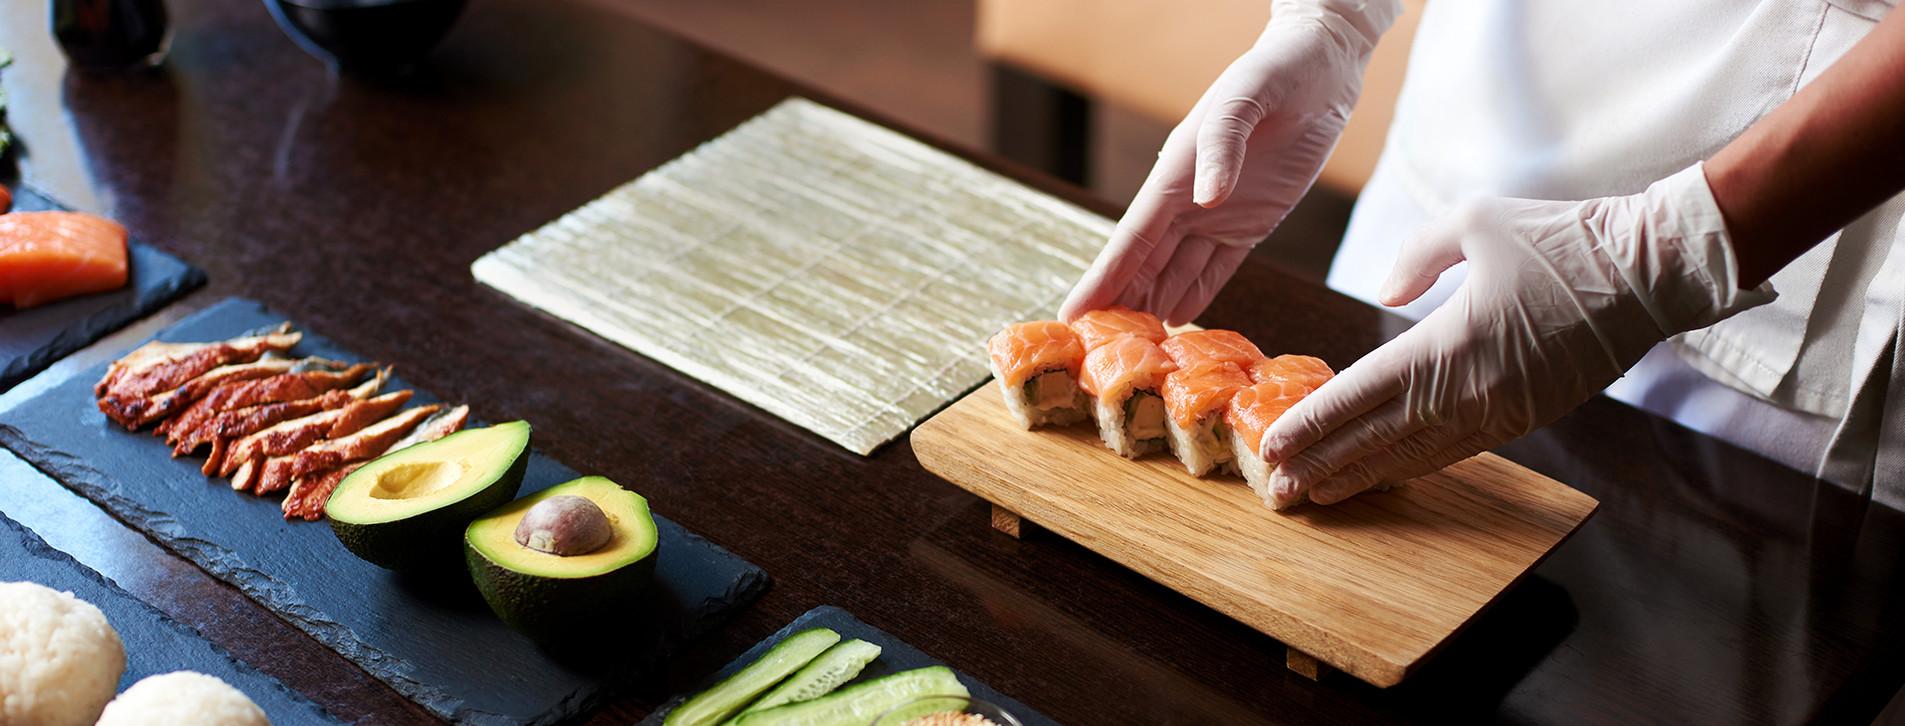 Фото 1 - Мастер-класс суши для компании